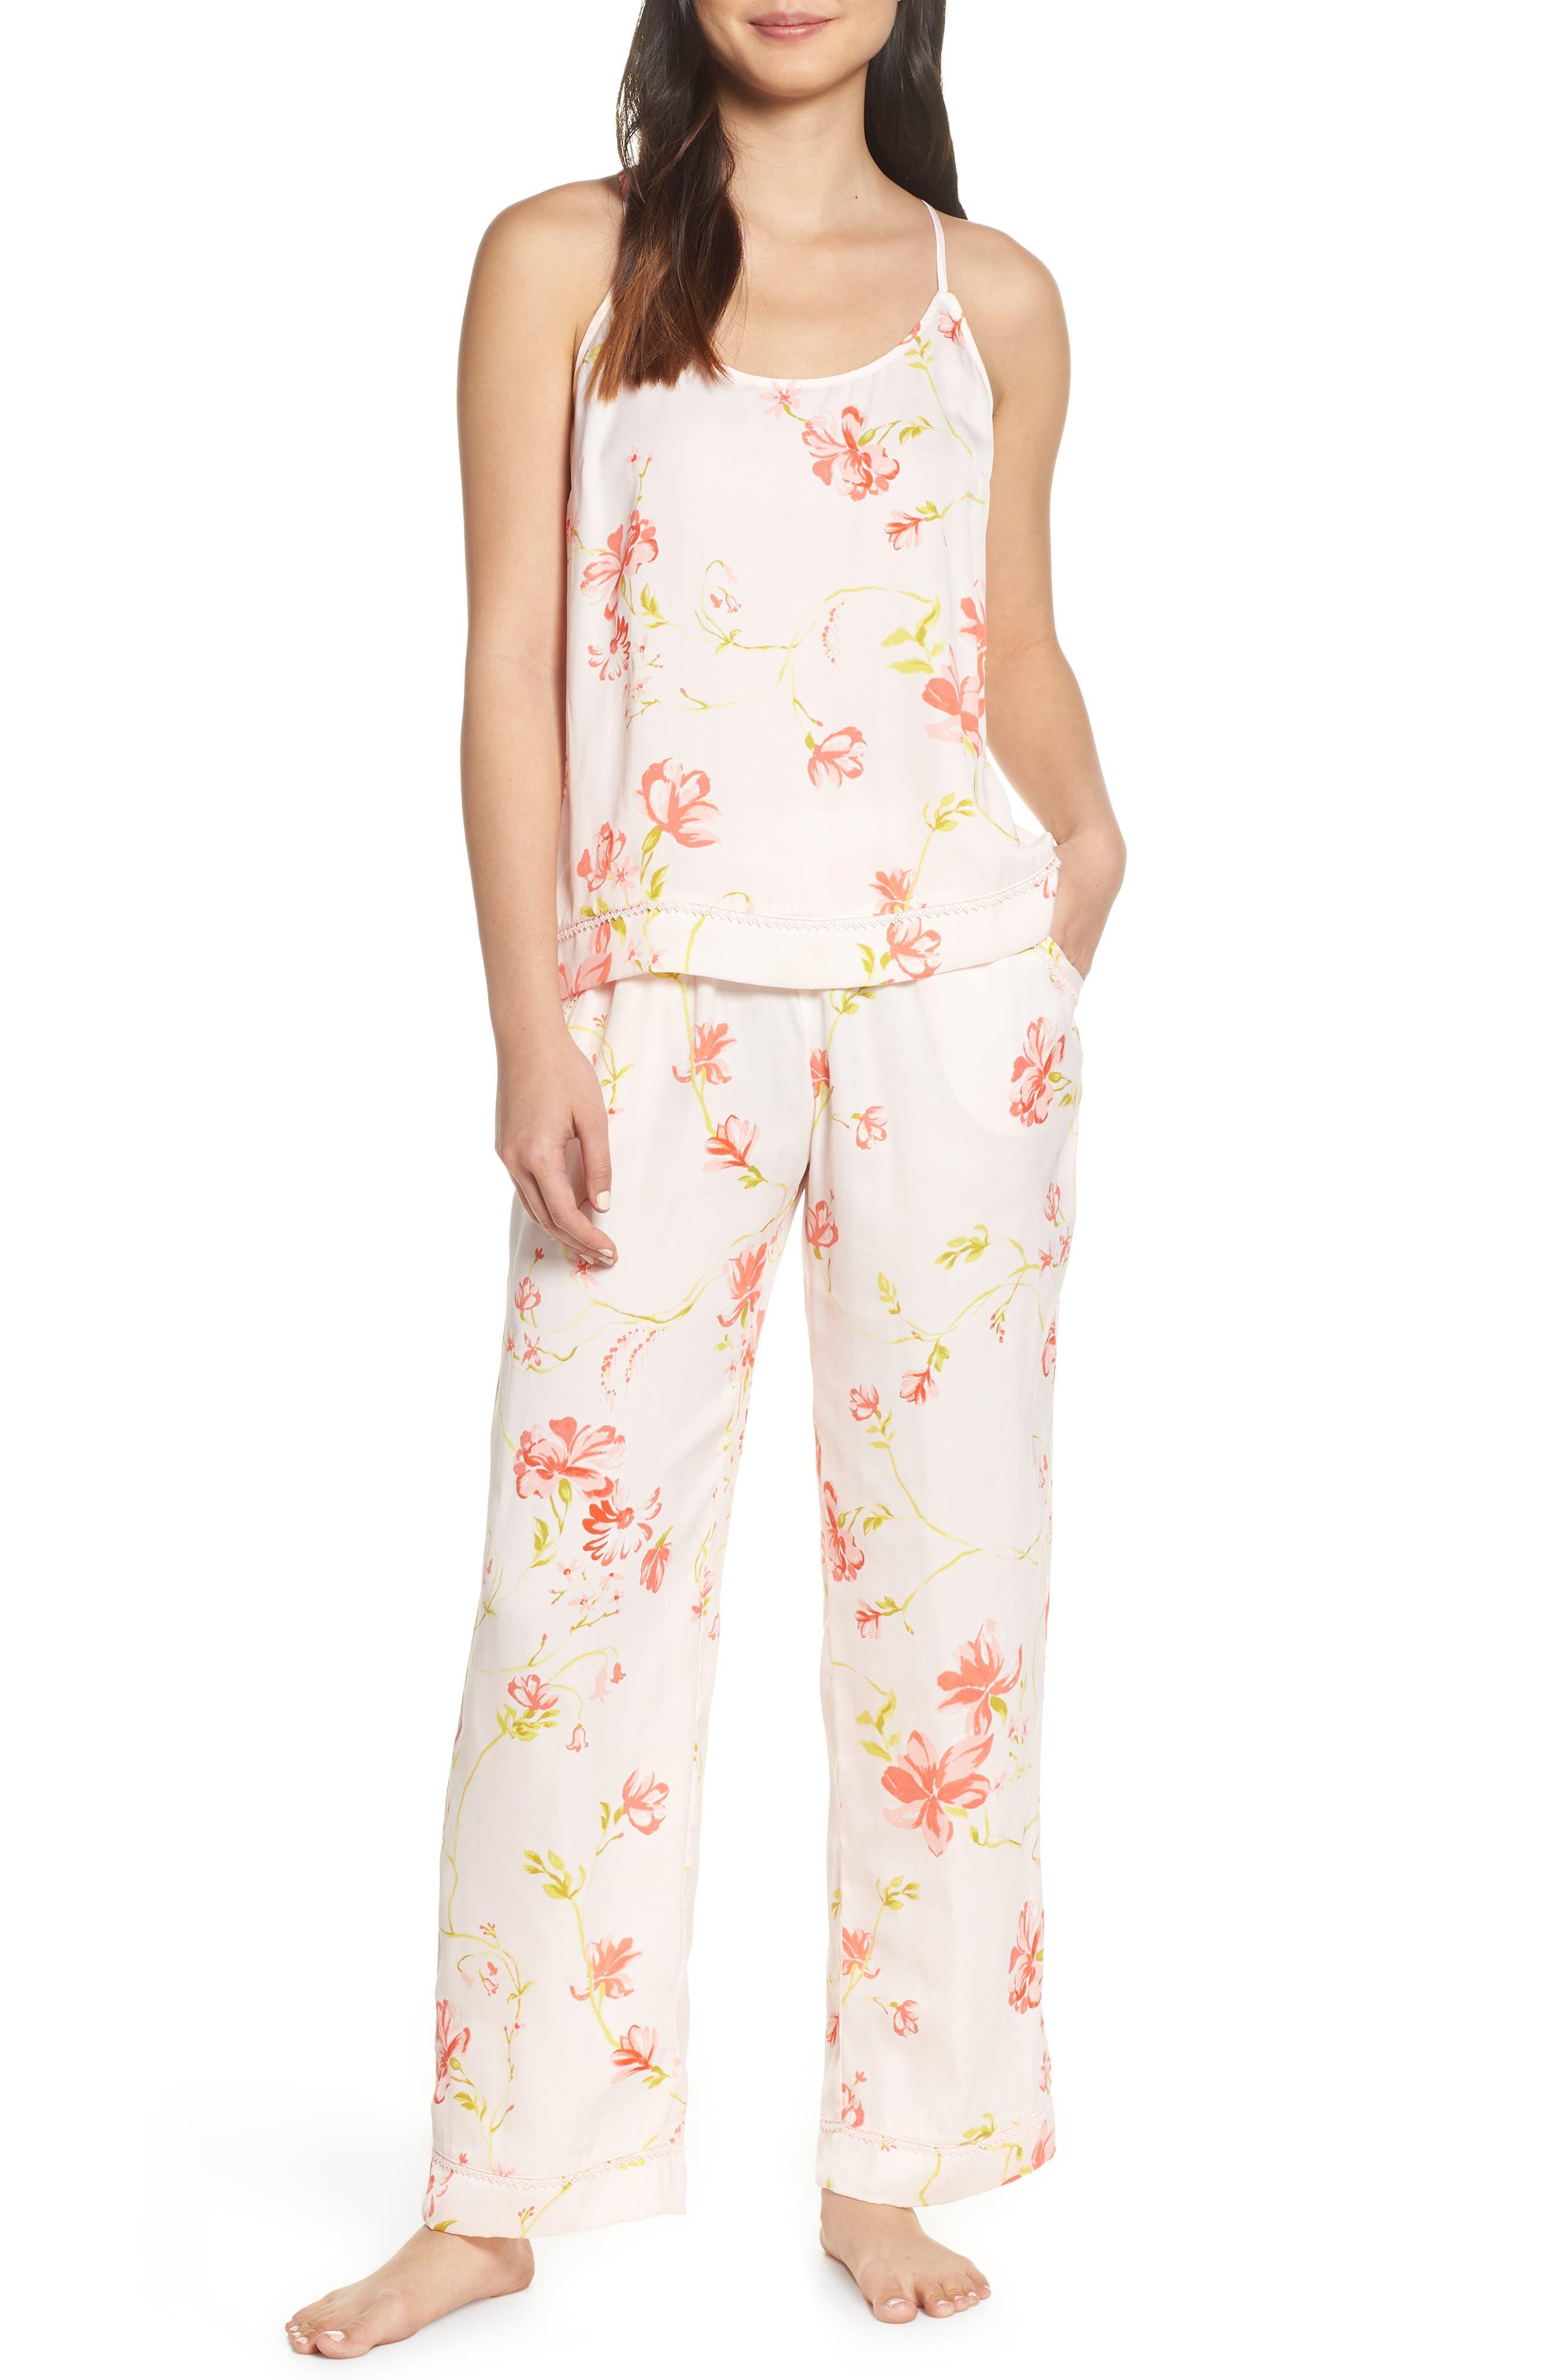 Nordstrom Lingerie Sweet Dreams Satin Pajamas, Pink